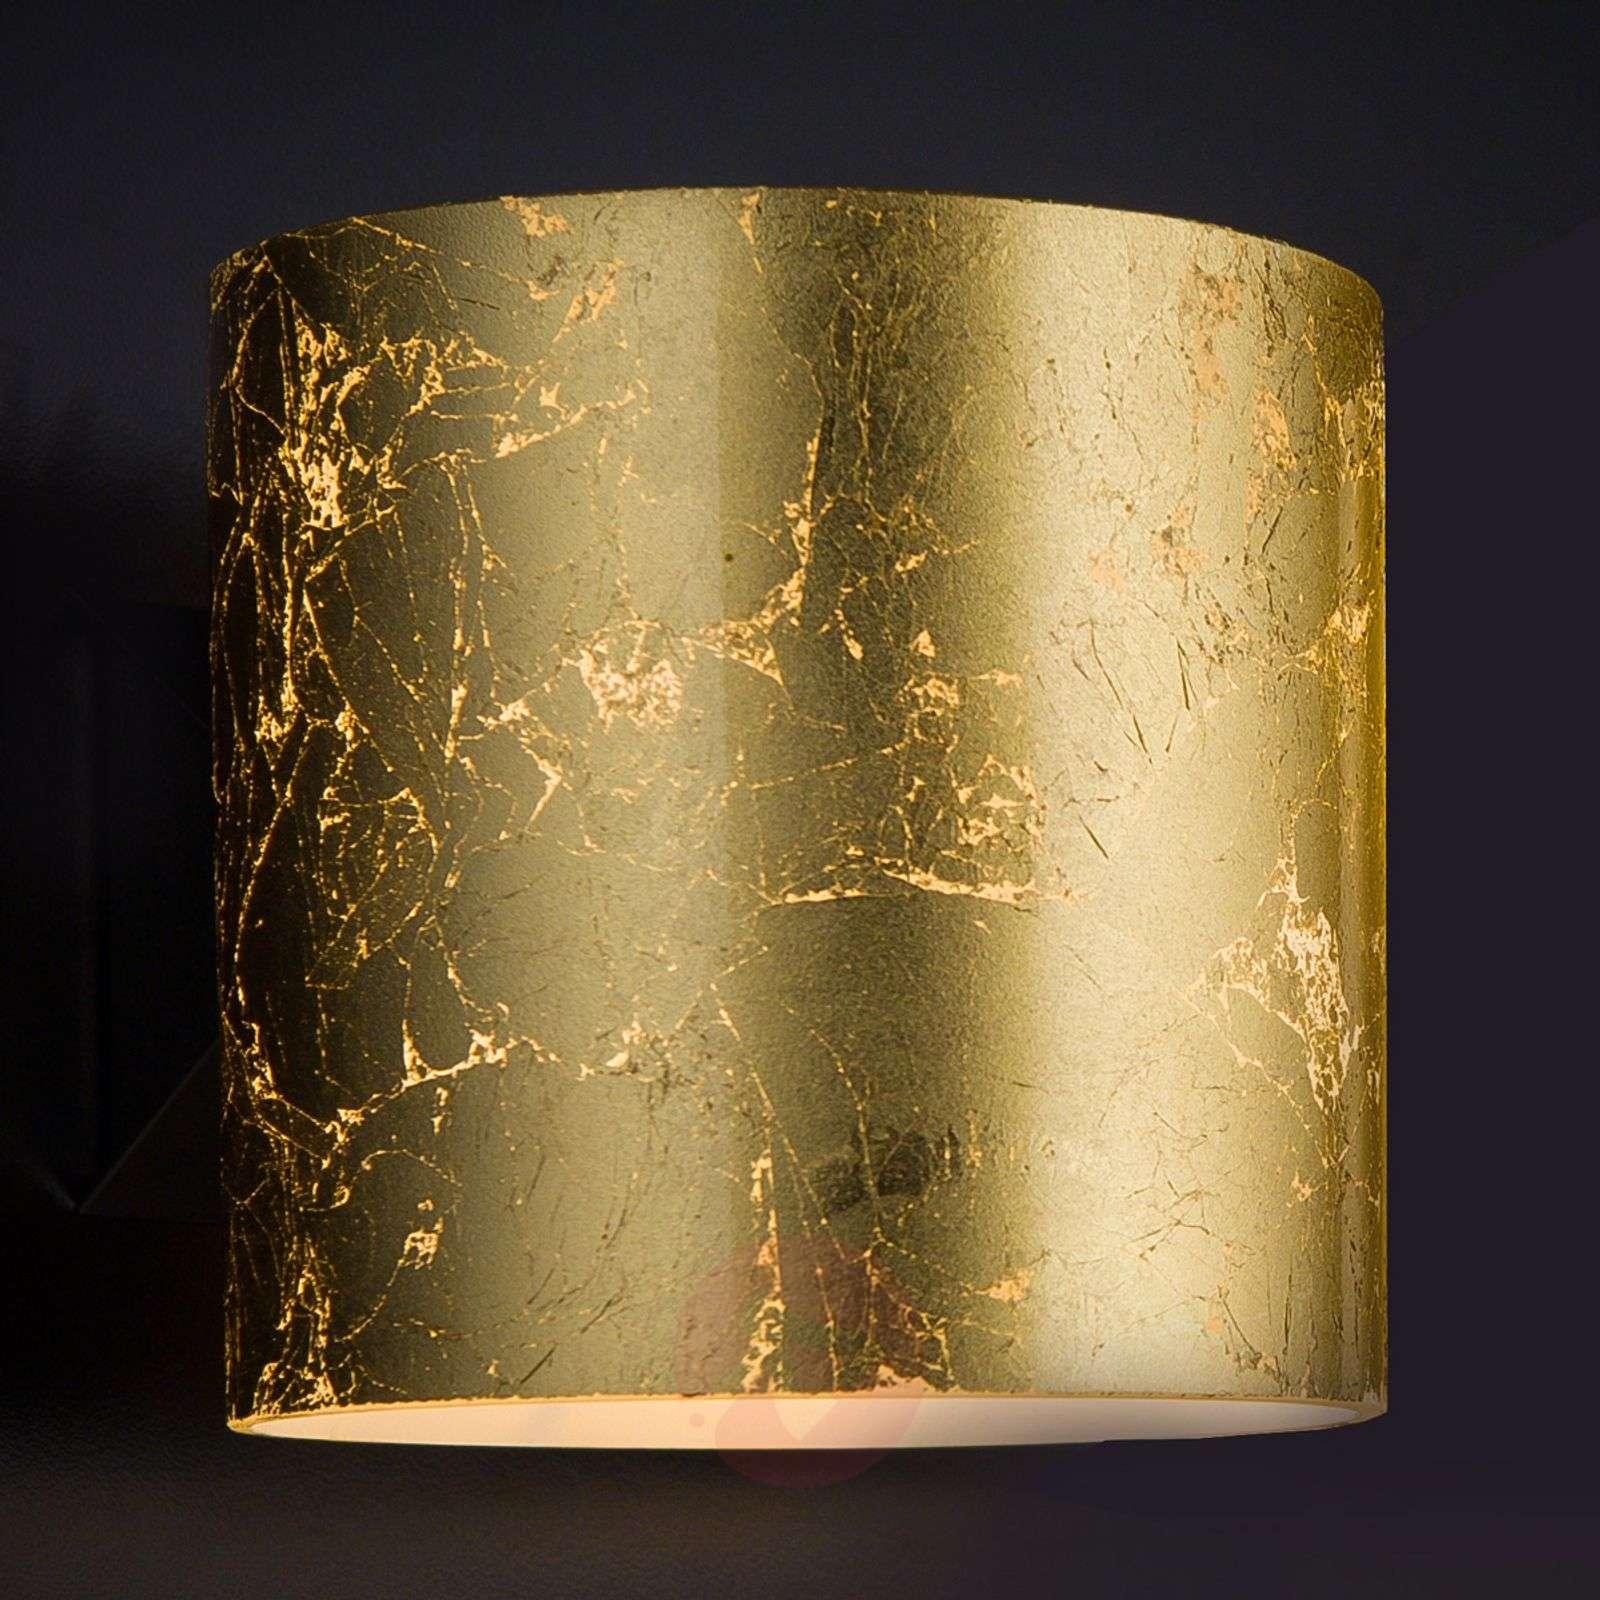 Golden designer wall light Brick, one-bulb-6511217-01